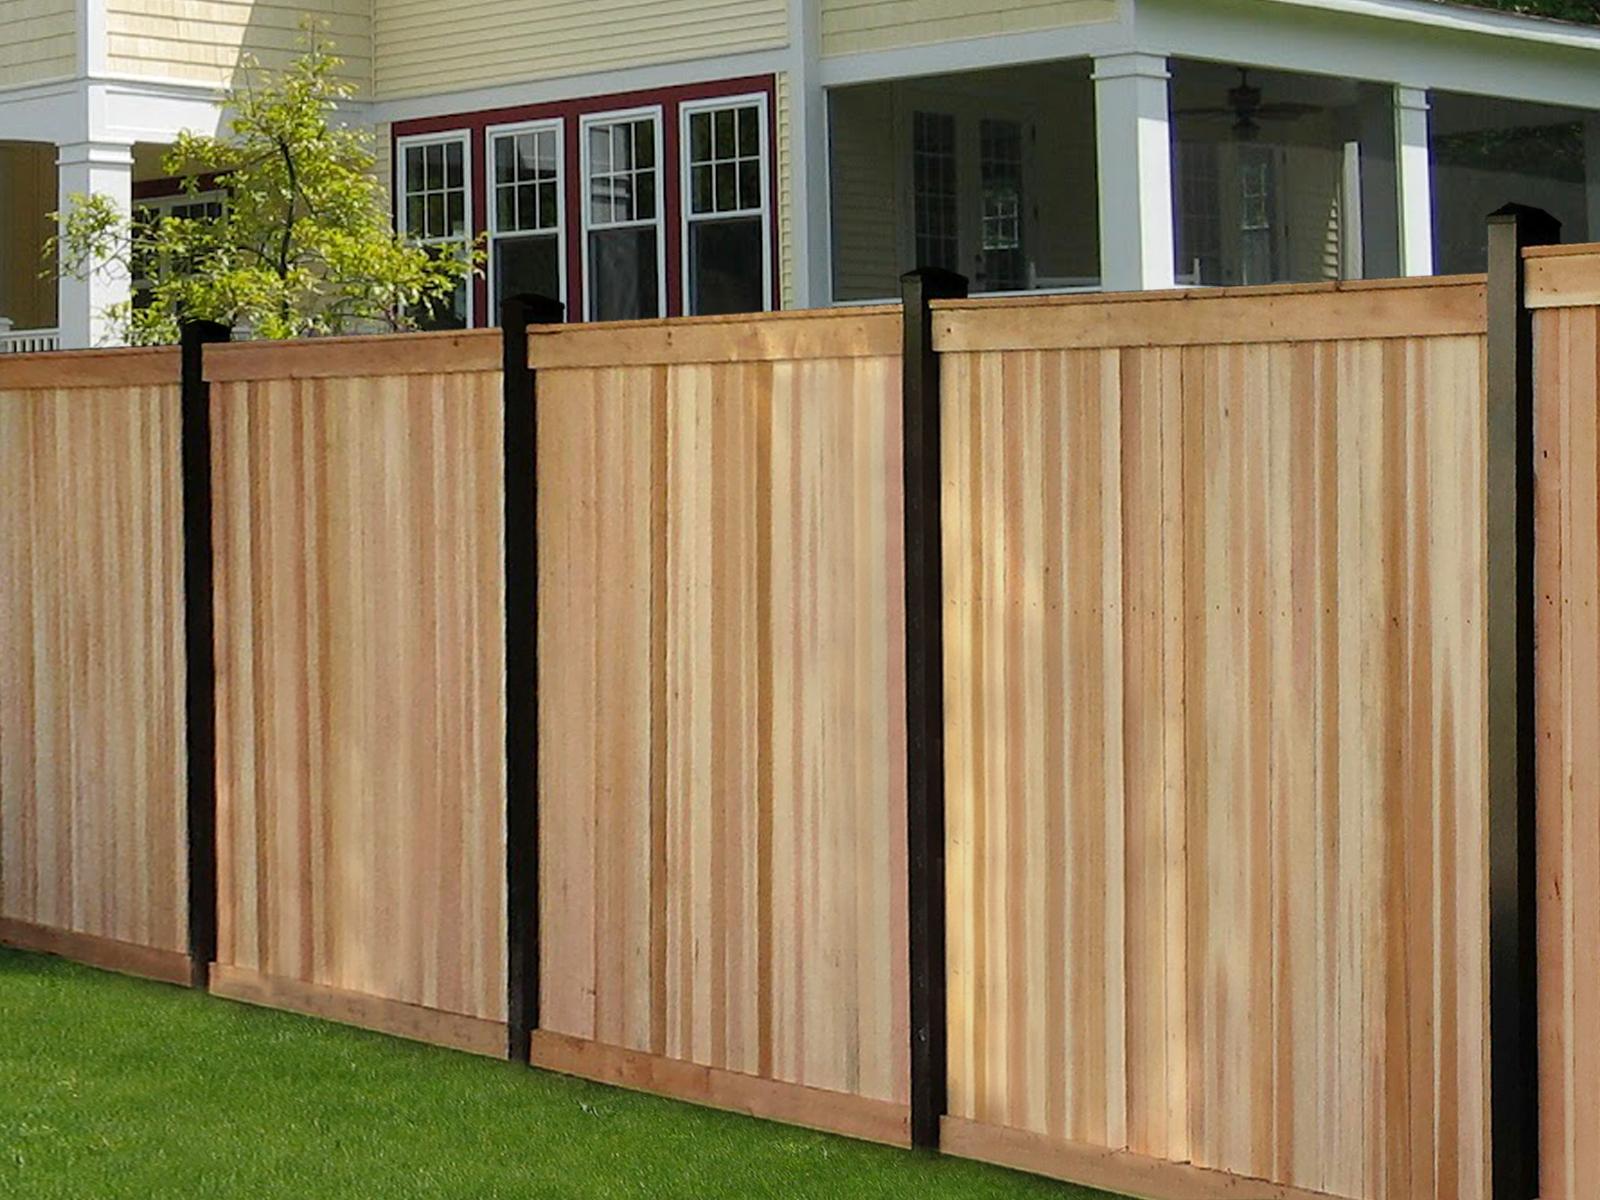 Custom Wood Fence In Mclean Va Builders Fence Company